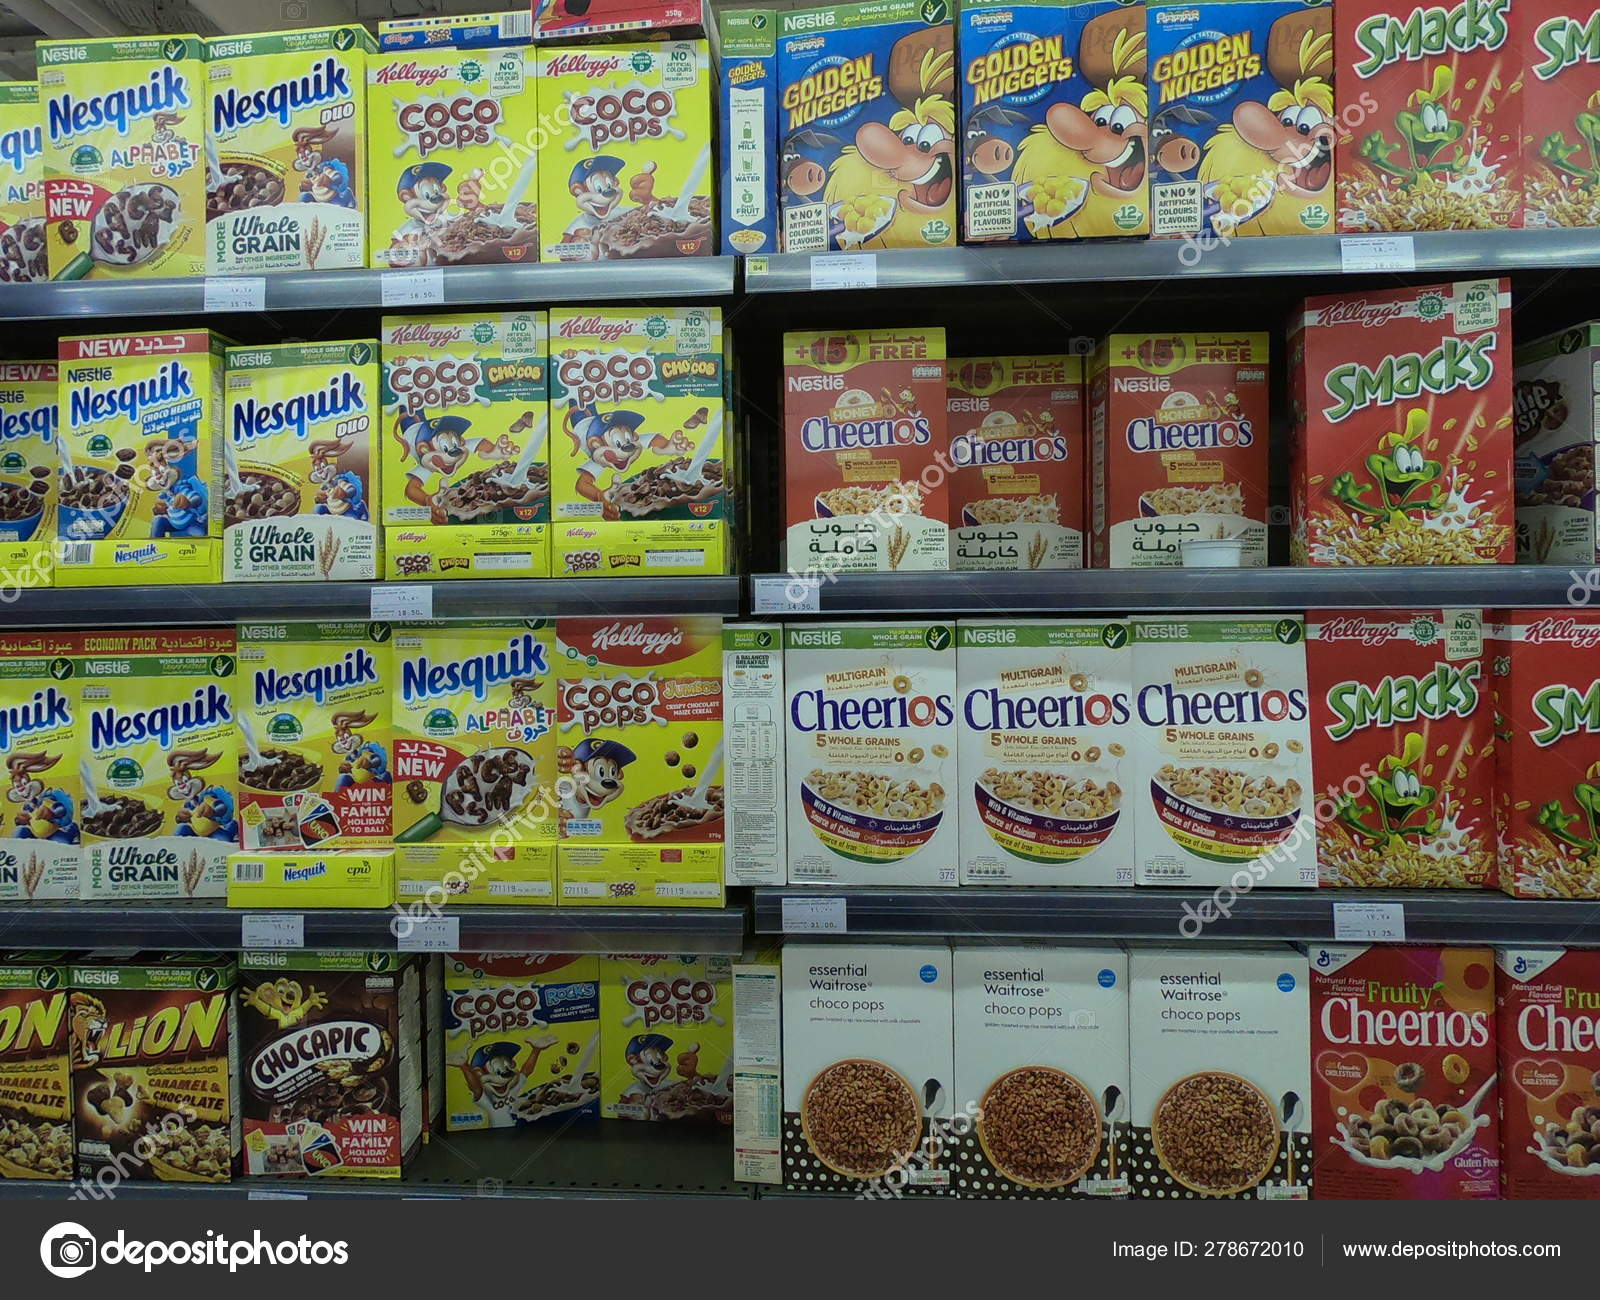 Dubai UAE - May 2019: Golden Nuggets, Cheerios,smacks